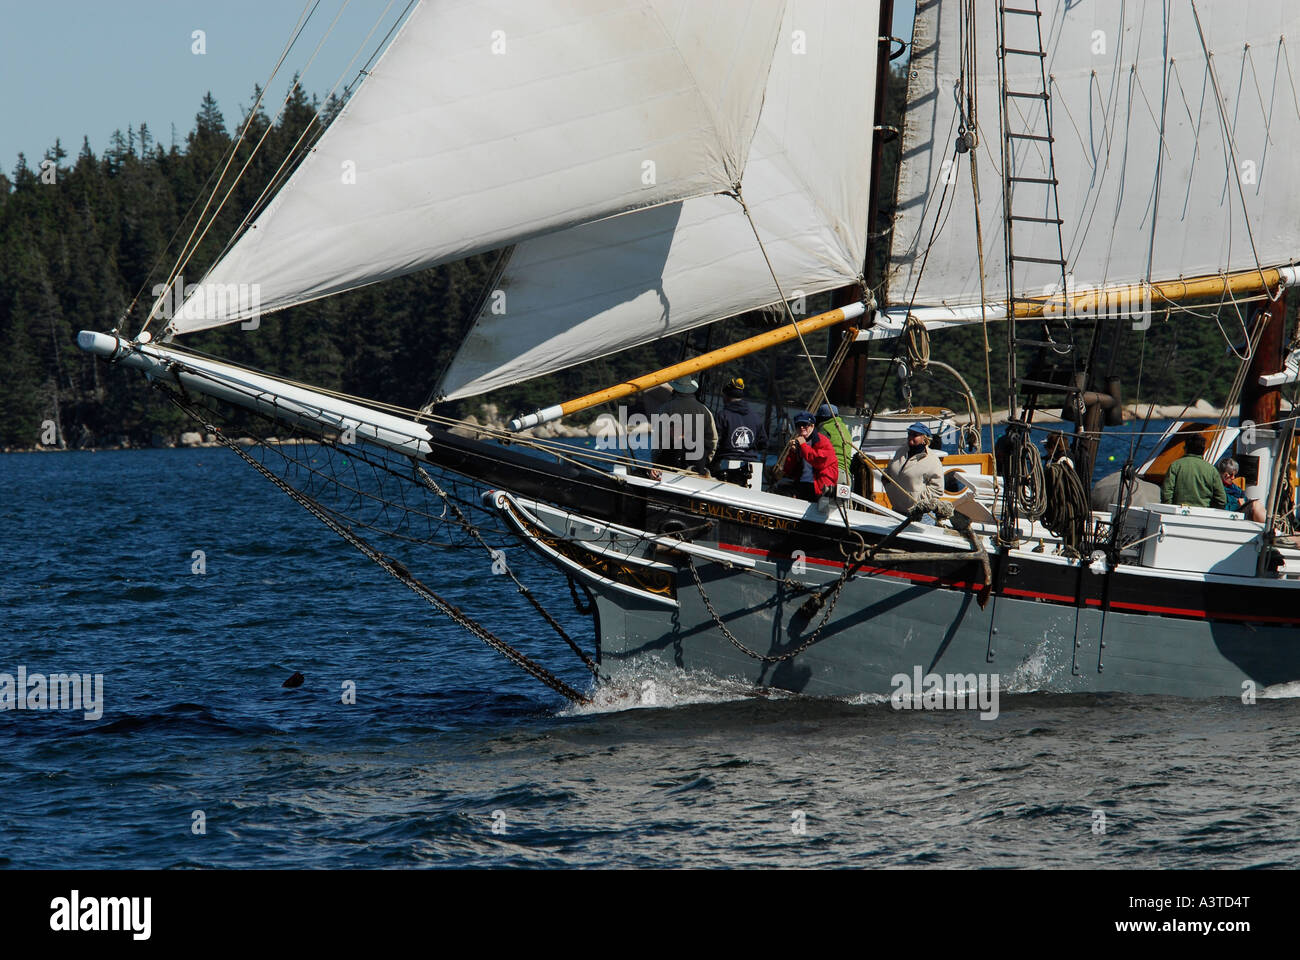 Wooden Boat Sail Reunion Eggemoggin Reach Stock Photo Royalty